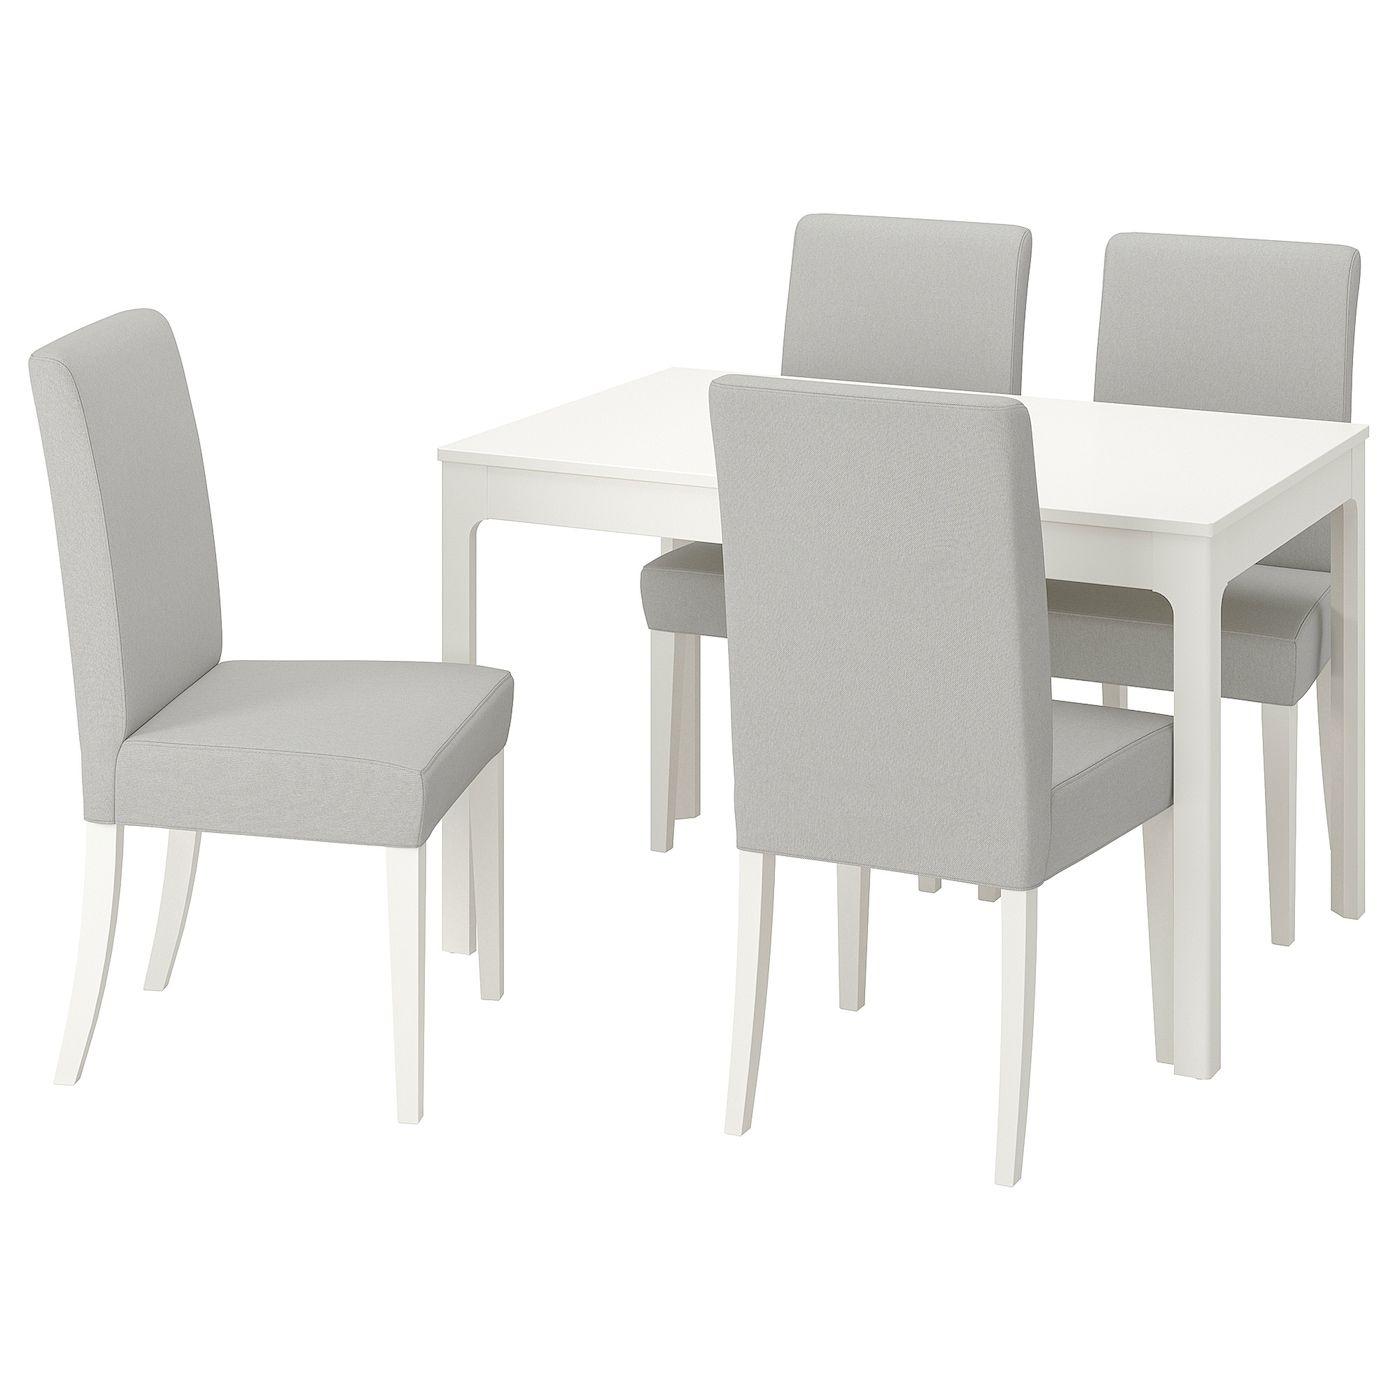 Ekedalen Henriksdal Table And 4 Chairs White Orrsta Light